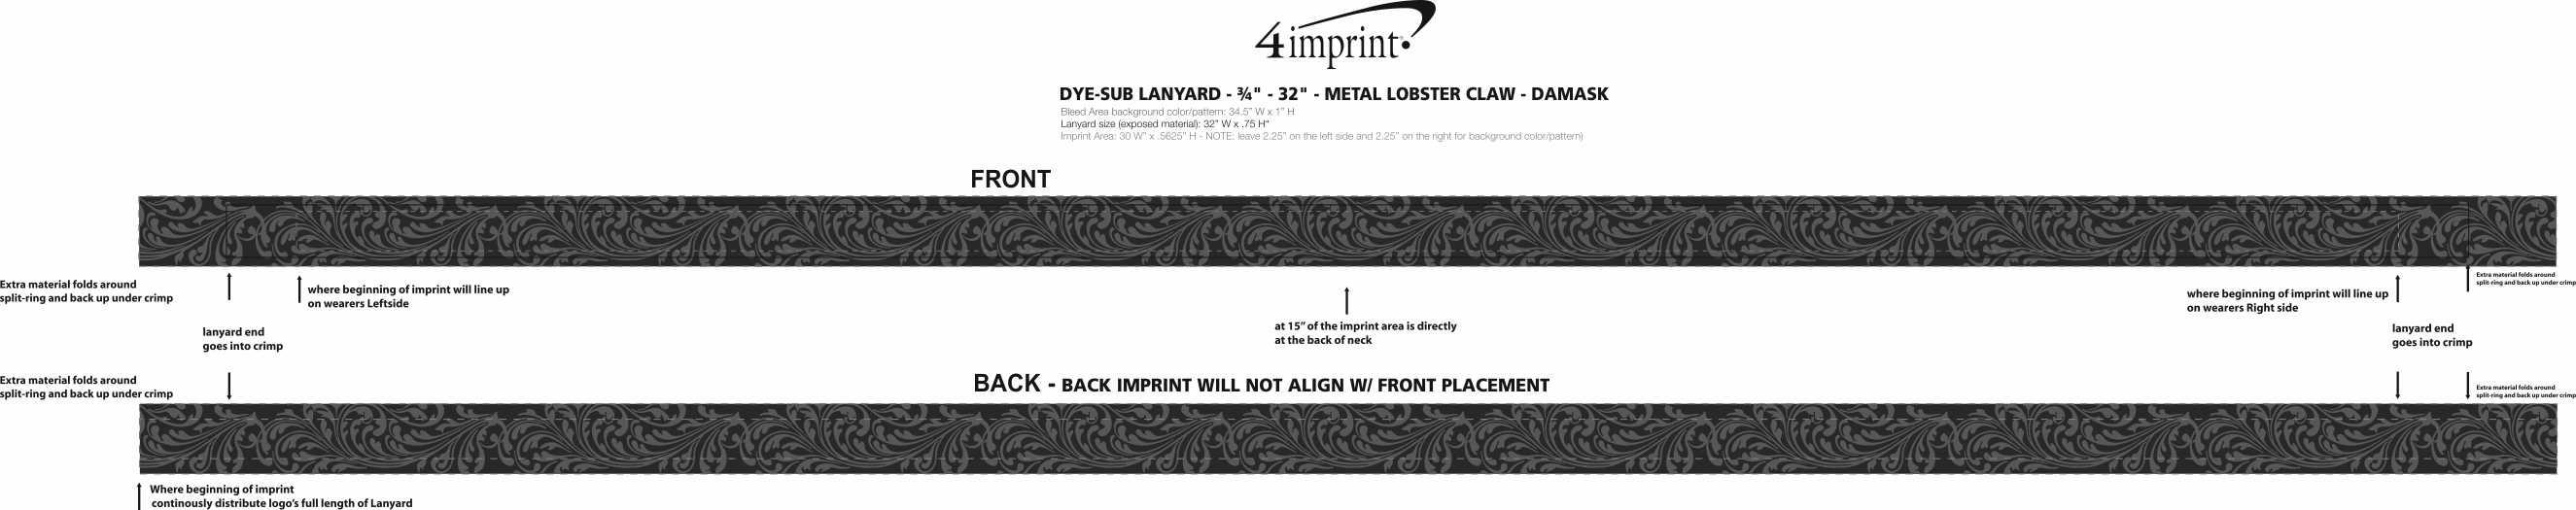 "Imprint Area of Dye-Sub Lanyard - 3/4"" - 32"" - Metal Lobster Claw - Damask"